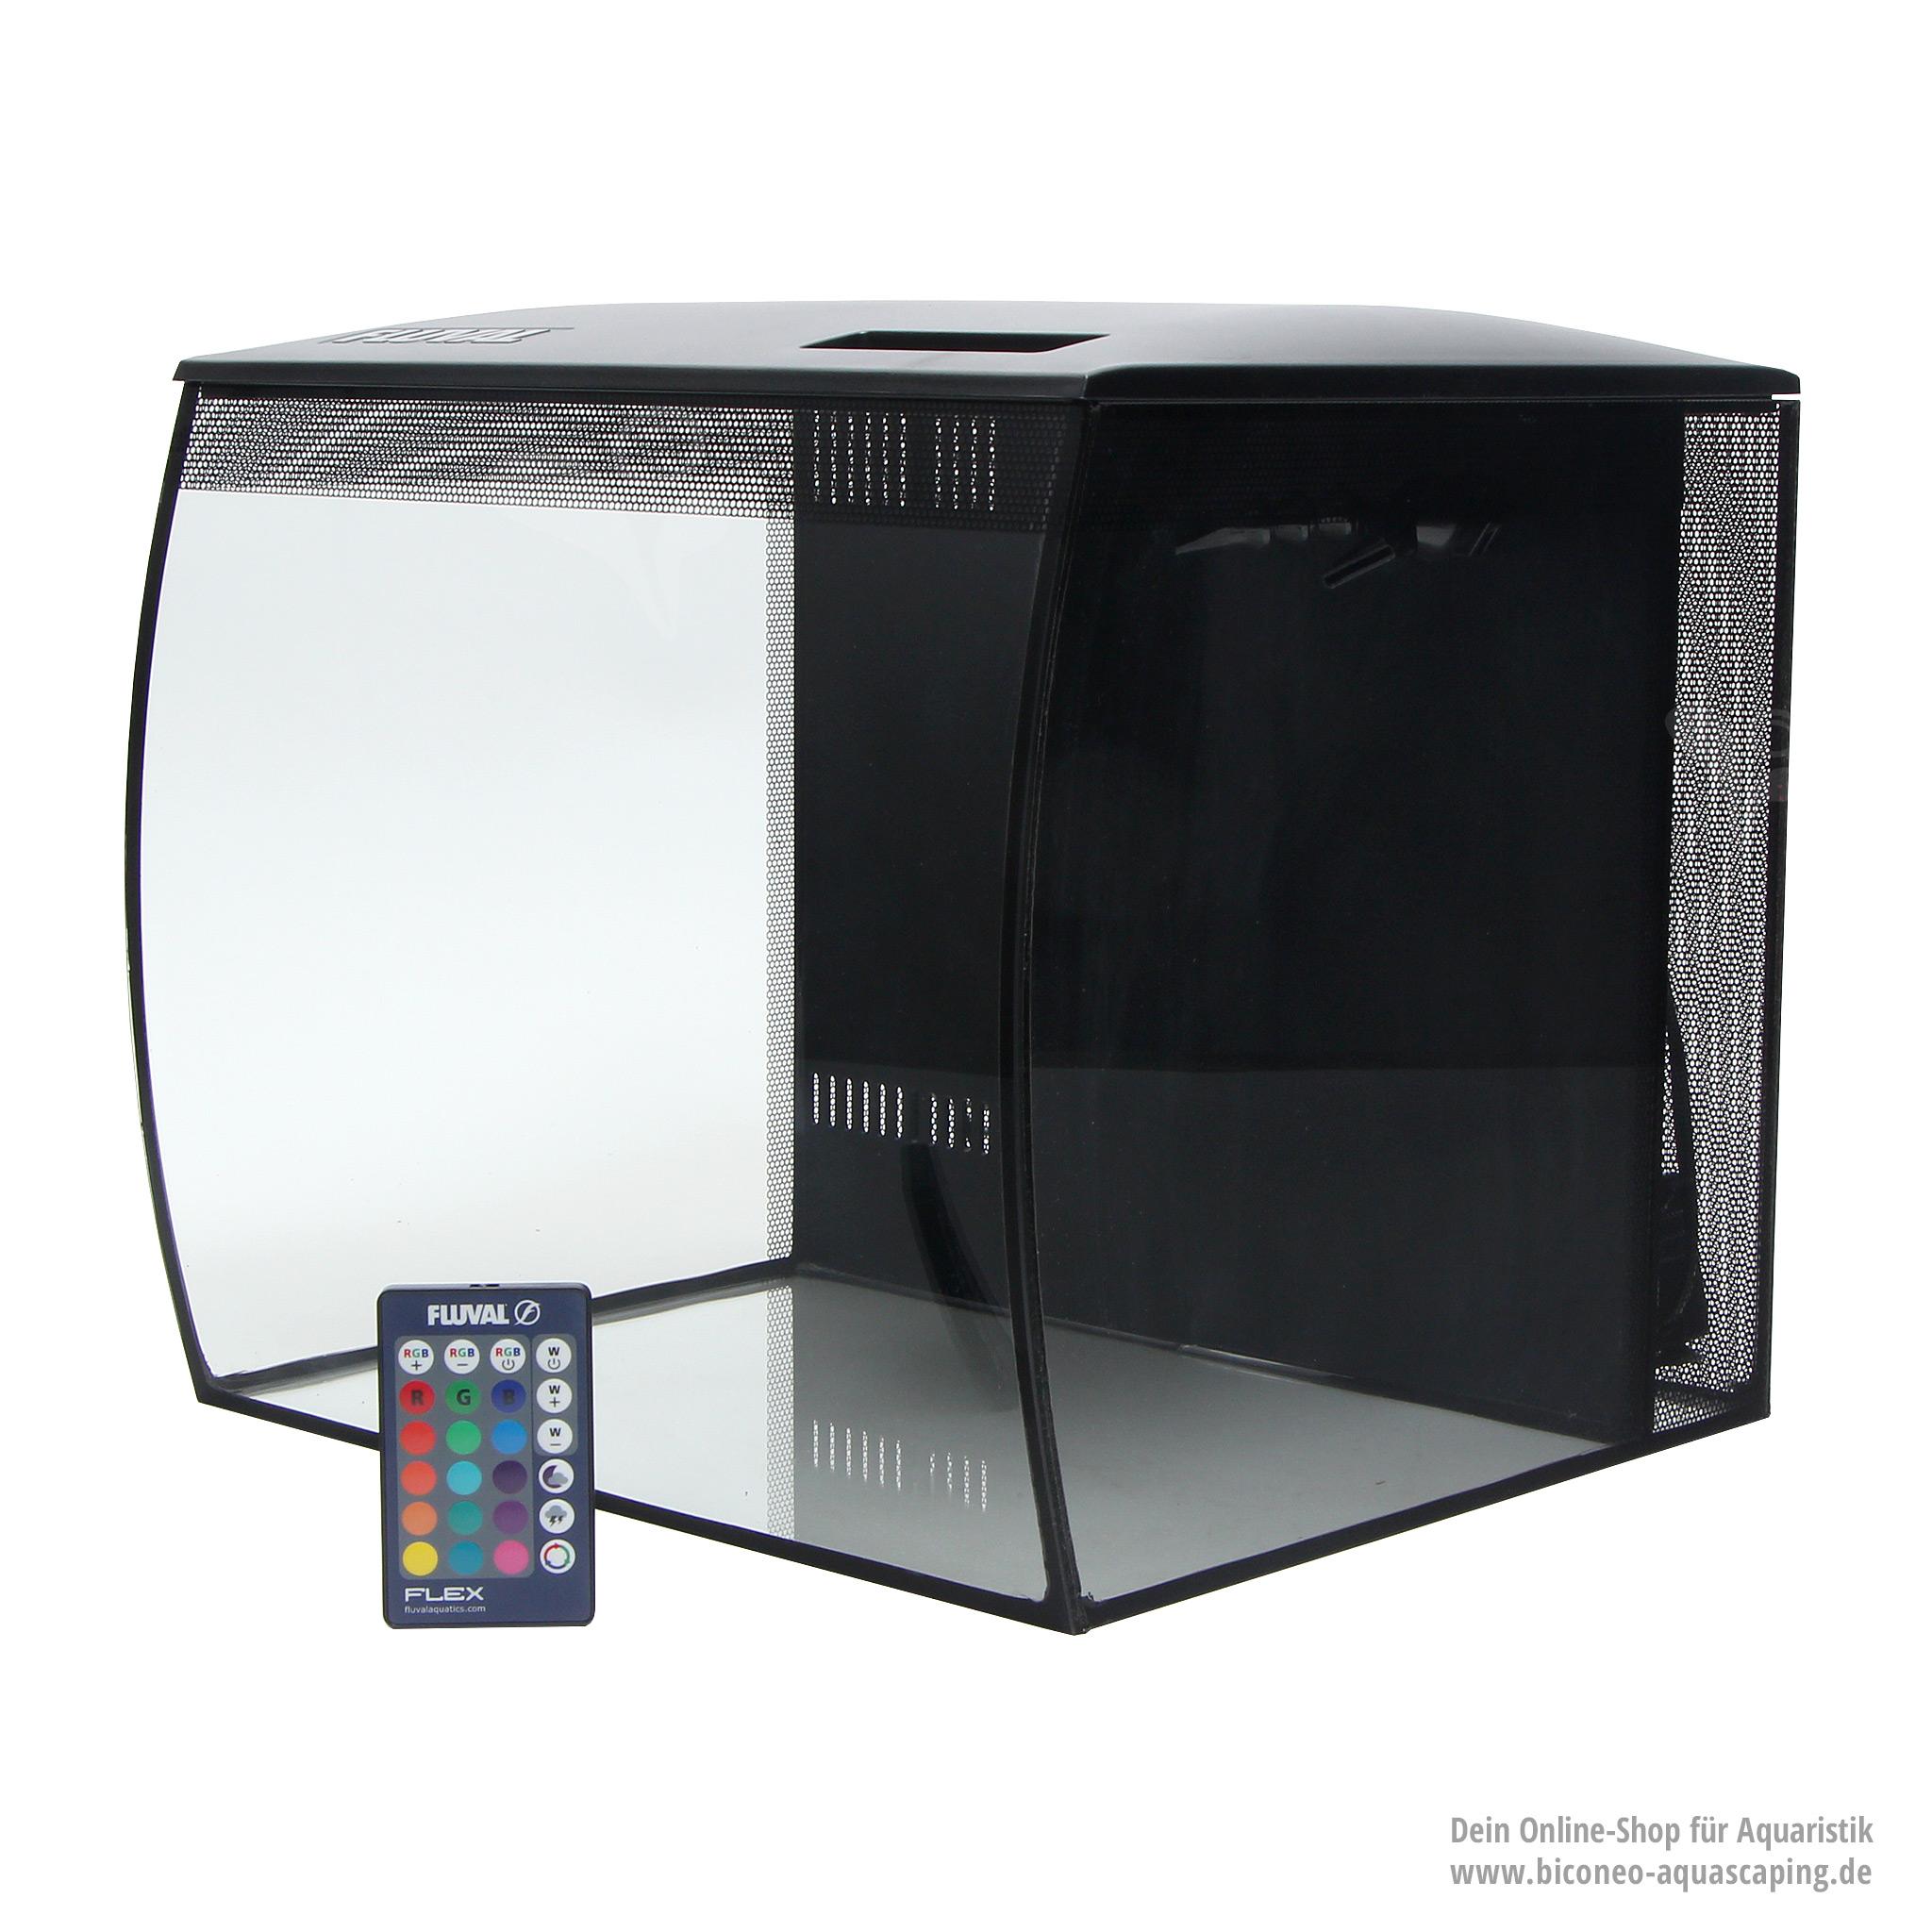 fluval flex 57l aquarium komplettset. Black Bedroom Furniture Sets. Home Design Ideas